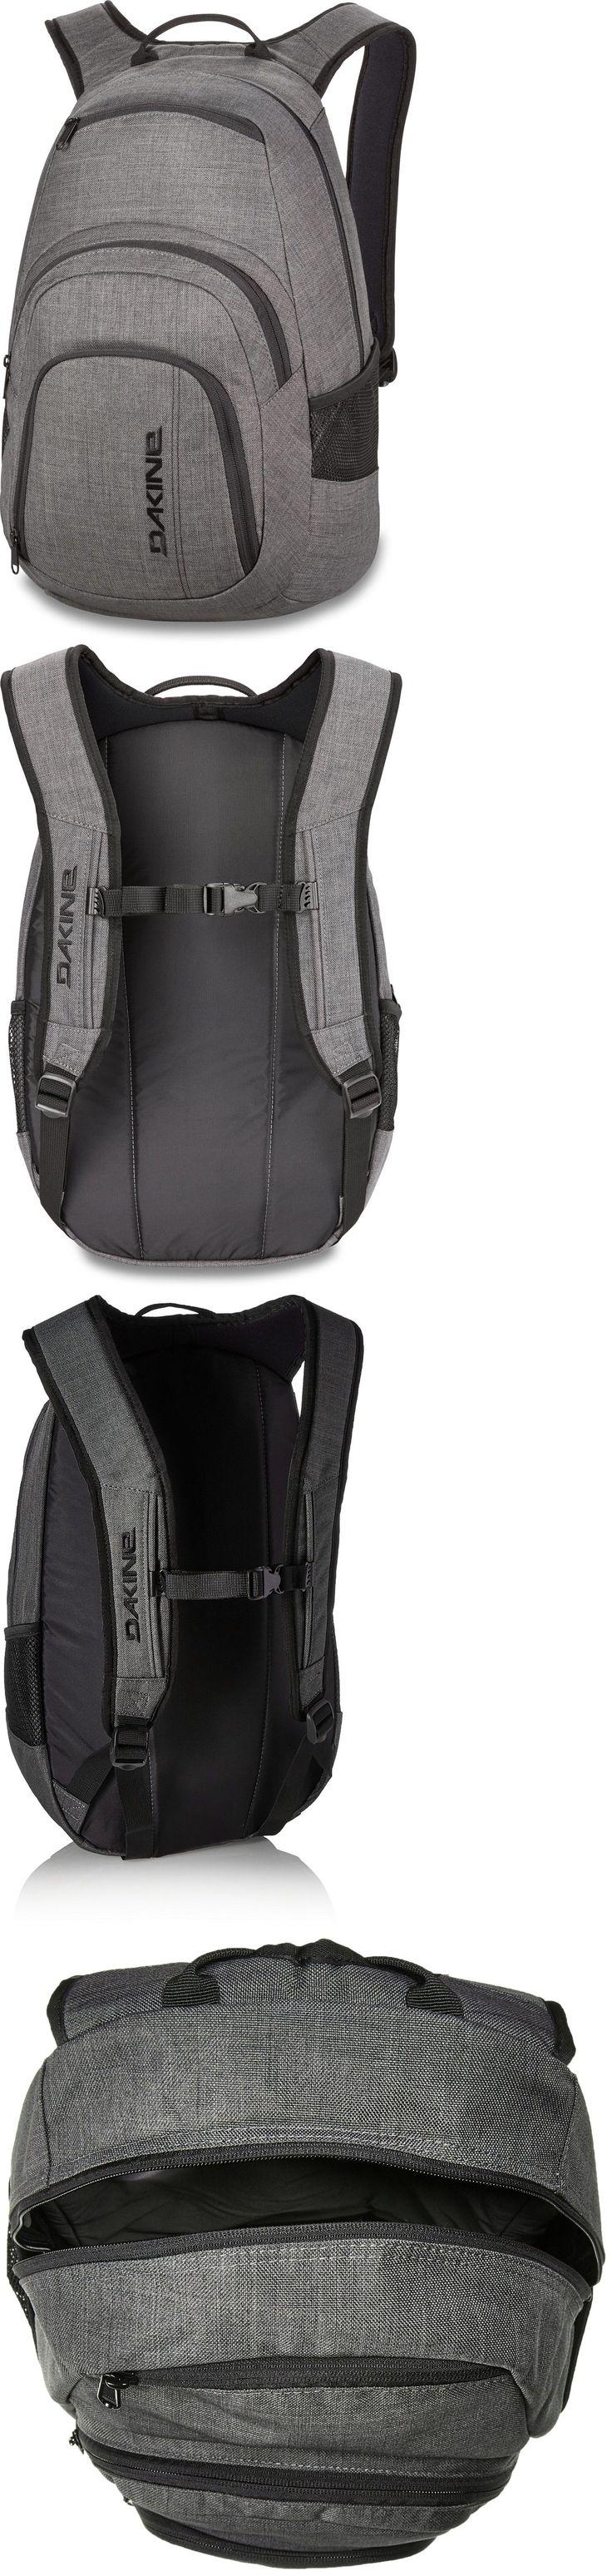 Other Skateboarding Clothing 159079: Dakine Campus Backpack, Carbon, 25L Genuine Dakine ® -> BUY IT NOW ONLY: $64.95 on eBay!